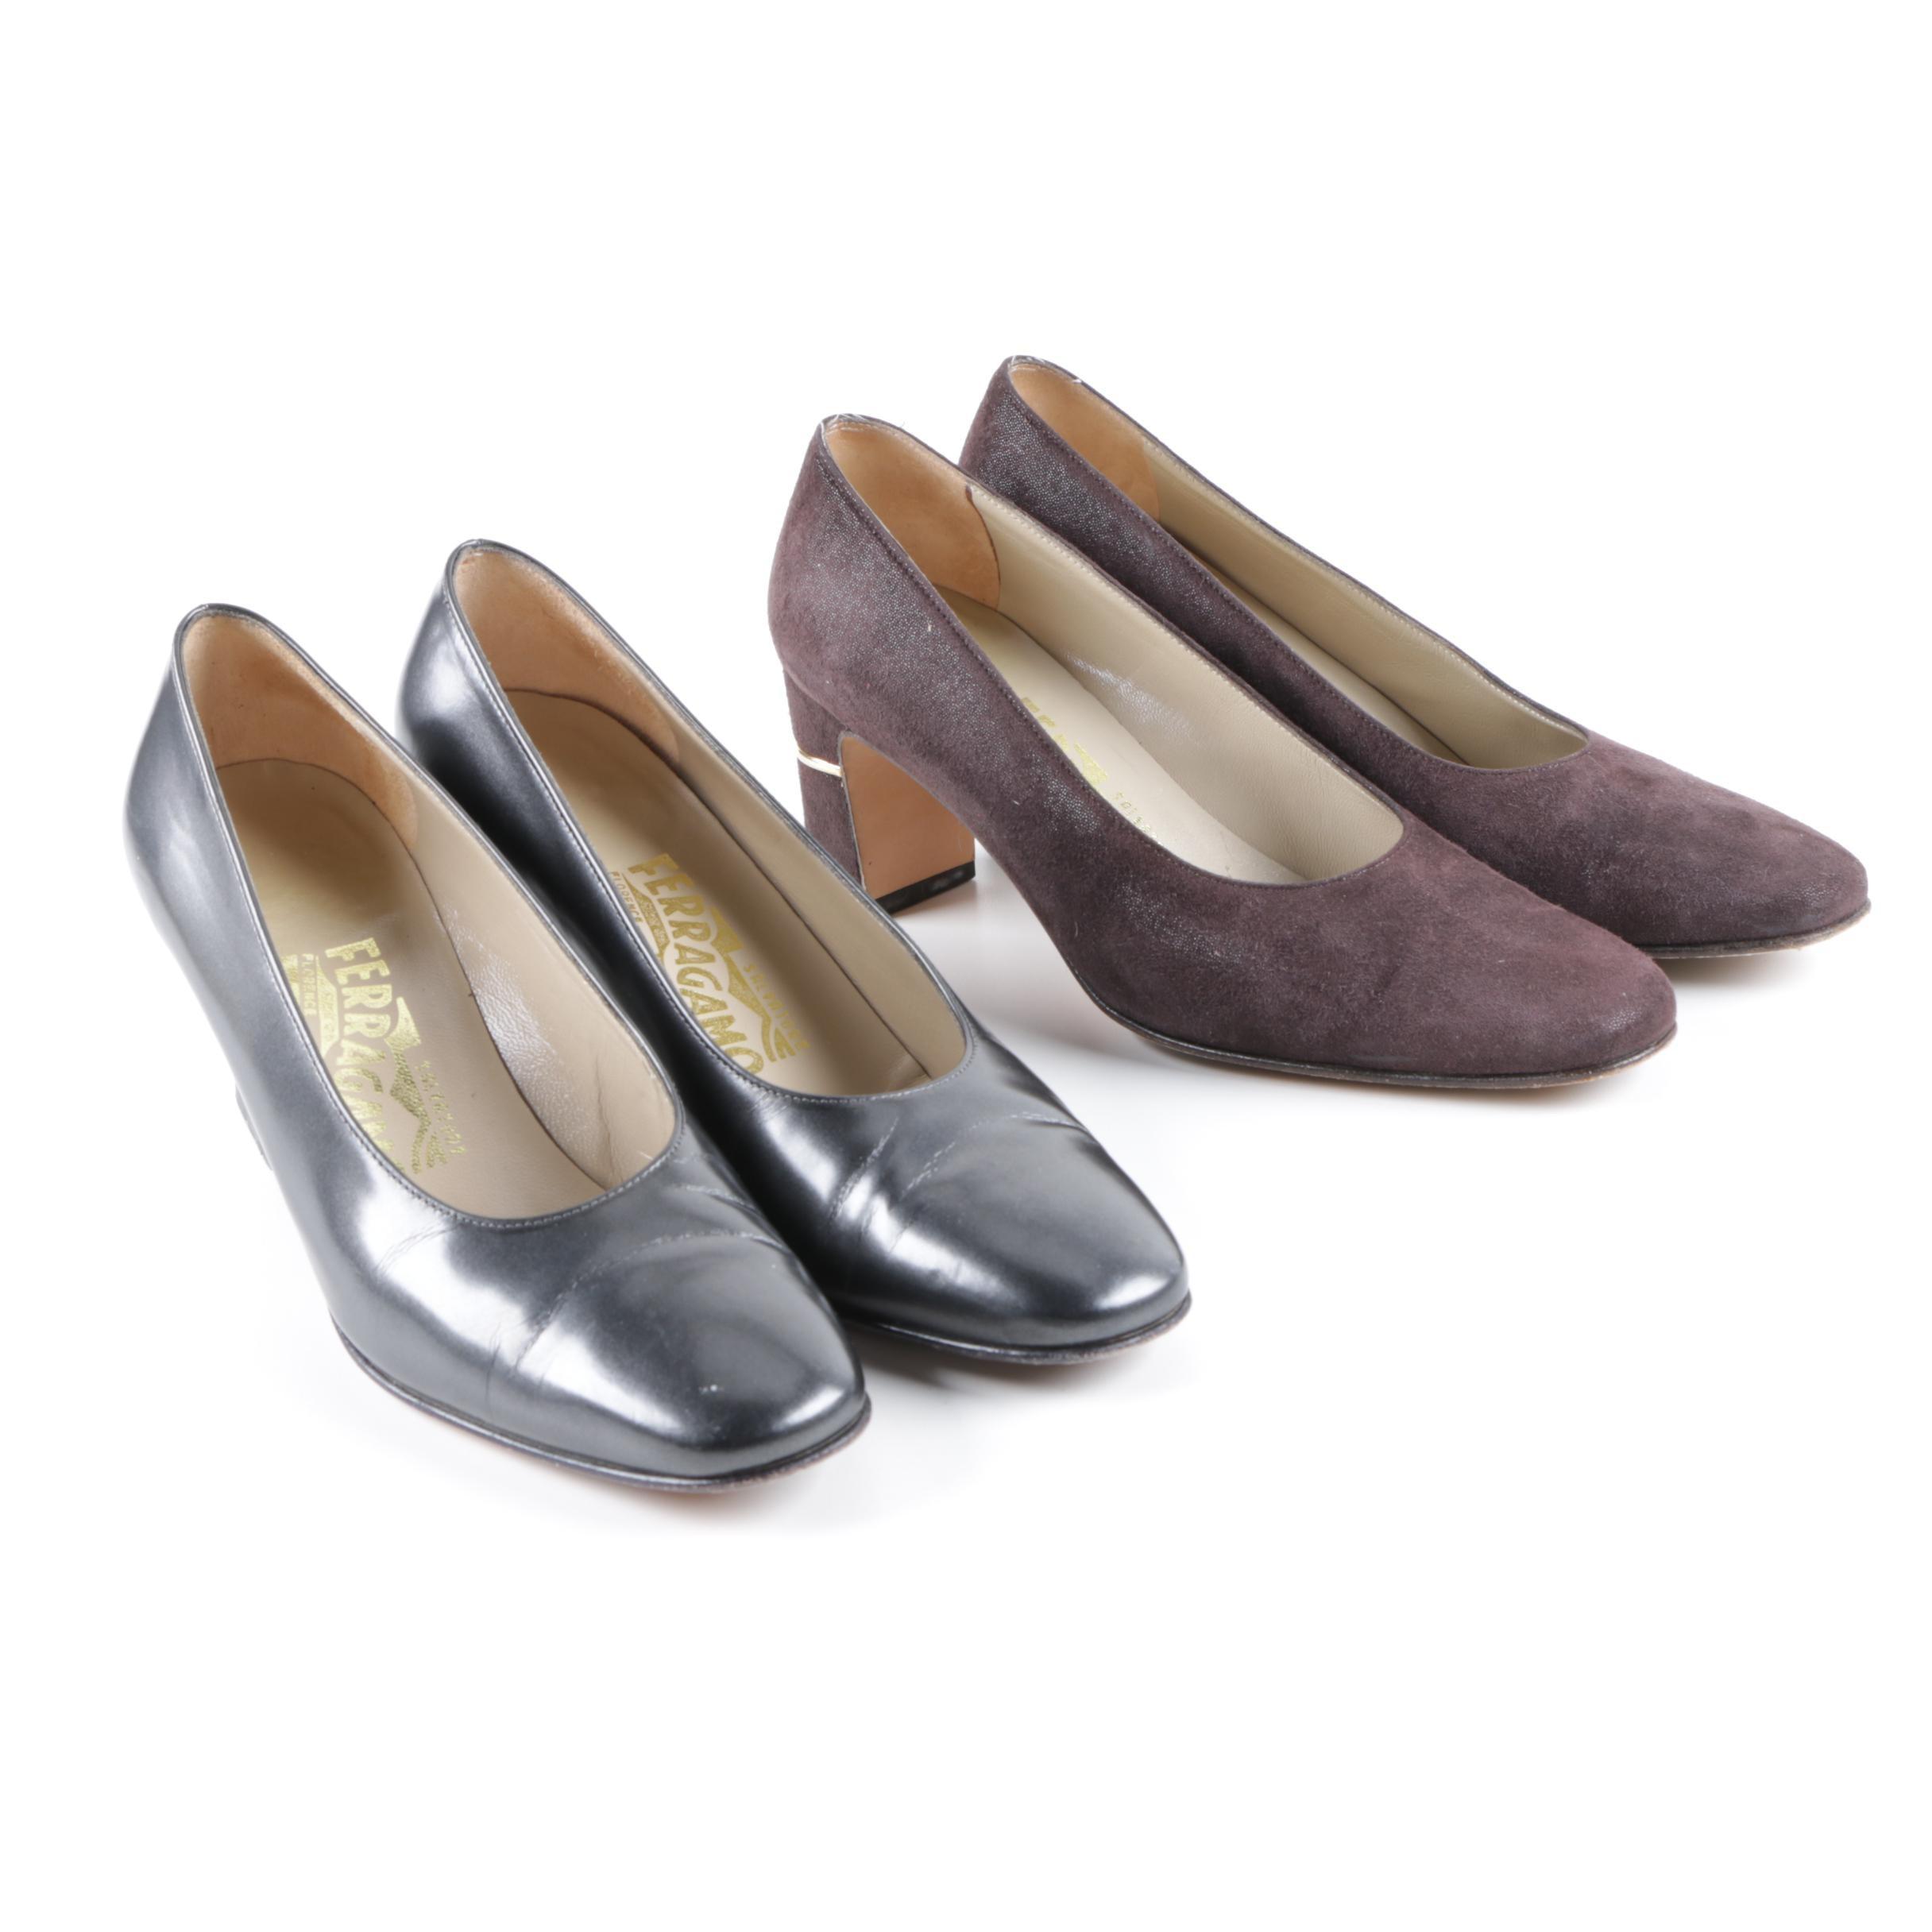 Women's Salvatore Ferragamo Leather and Suede Pumps